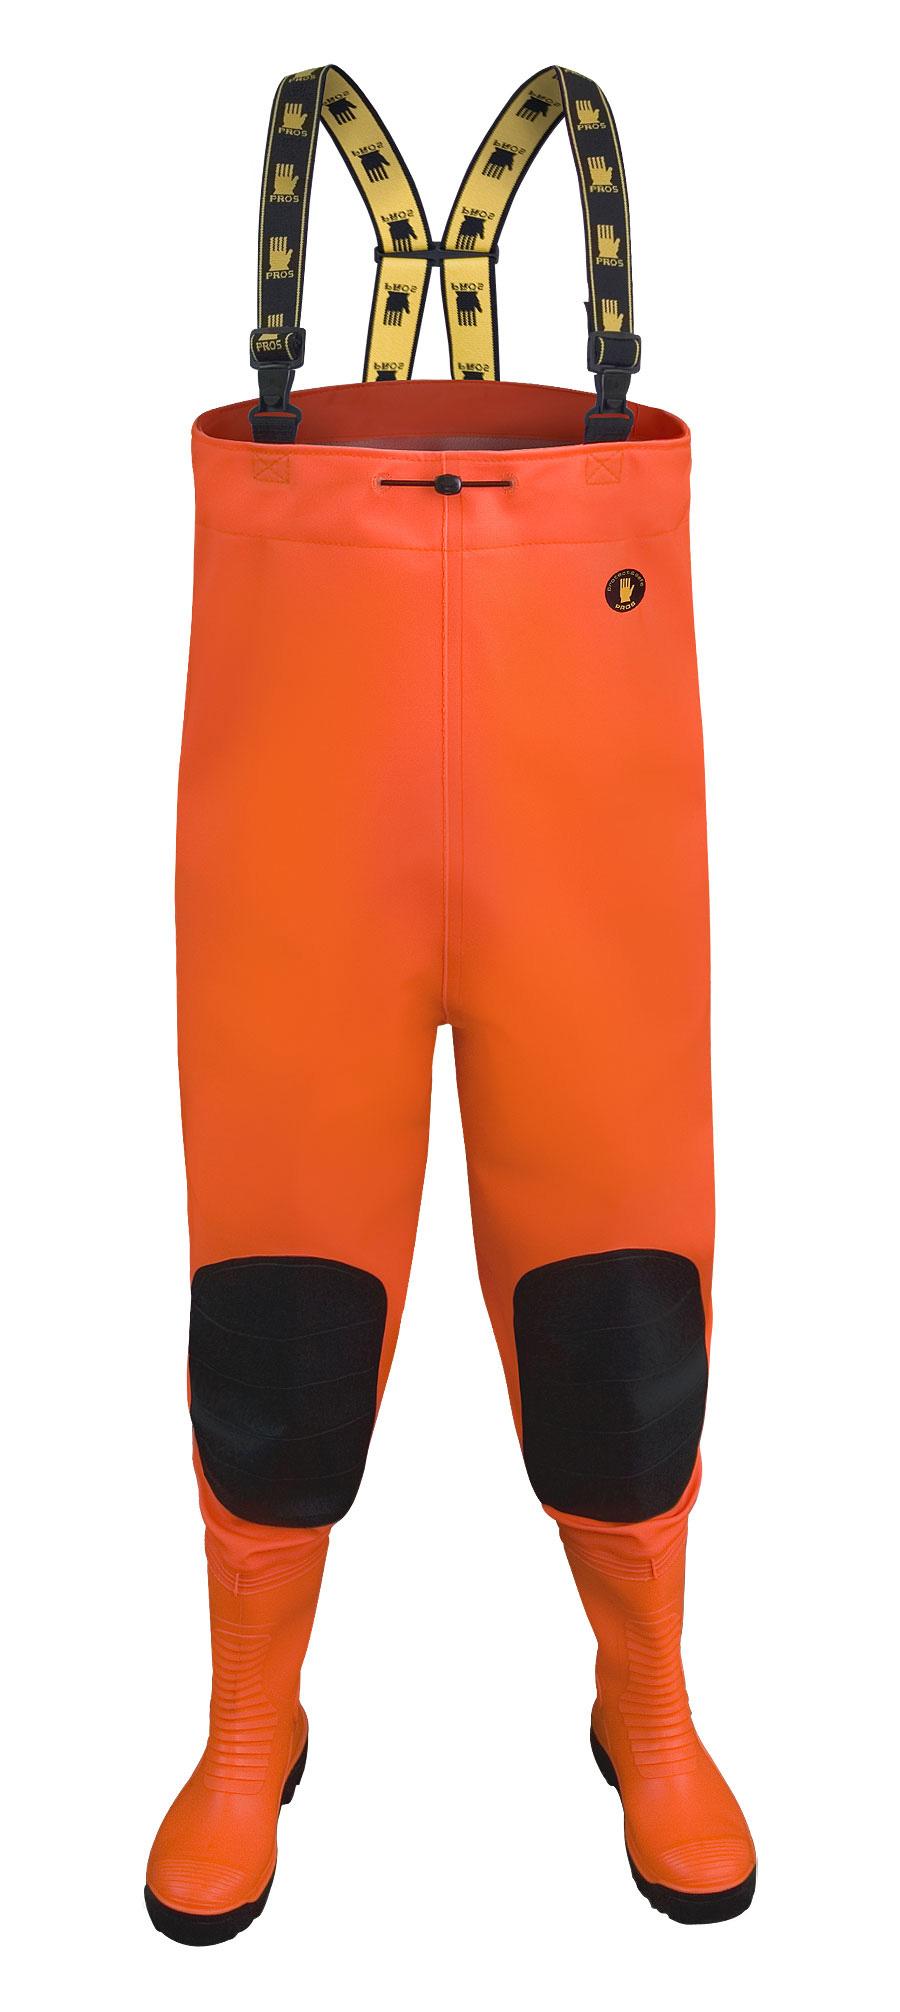 Brodící kalhoty MAX Fluo oranž vel.46    SBM01 Fluo or.  PROS